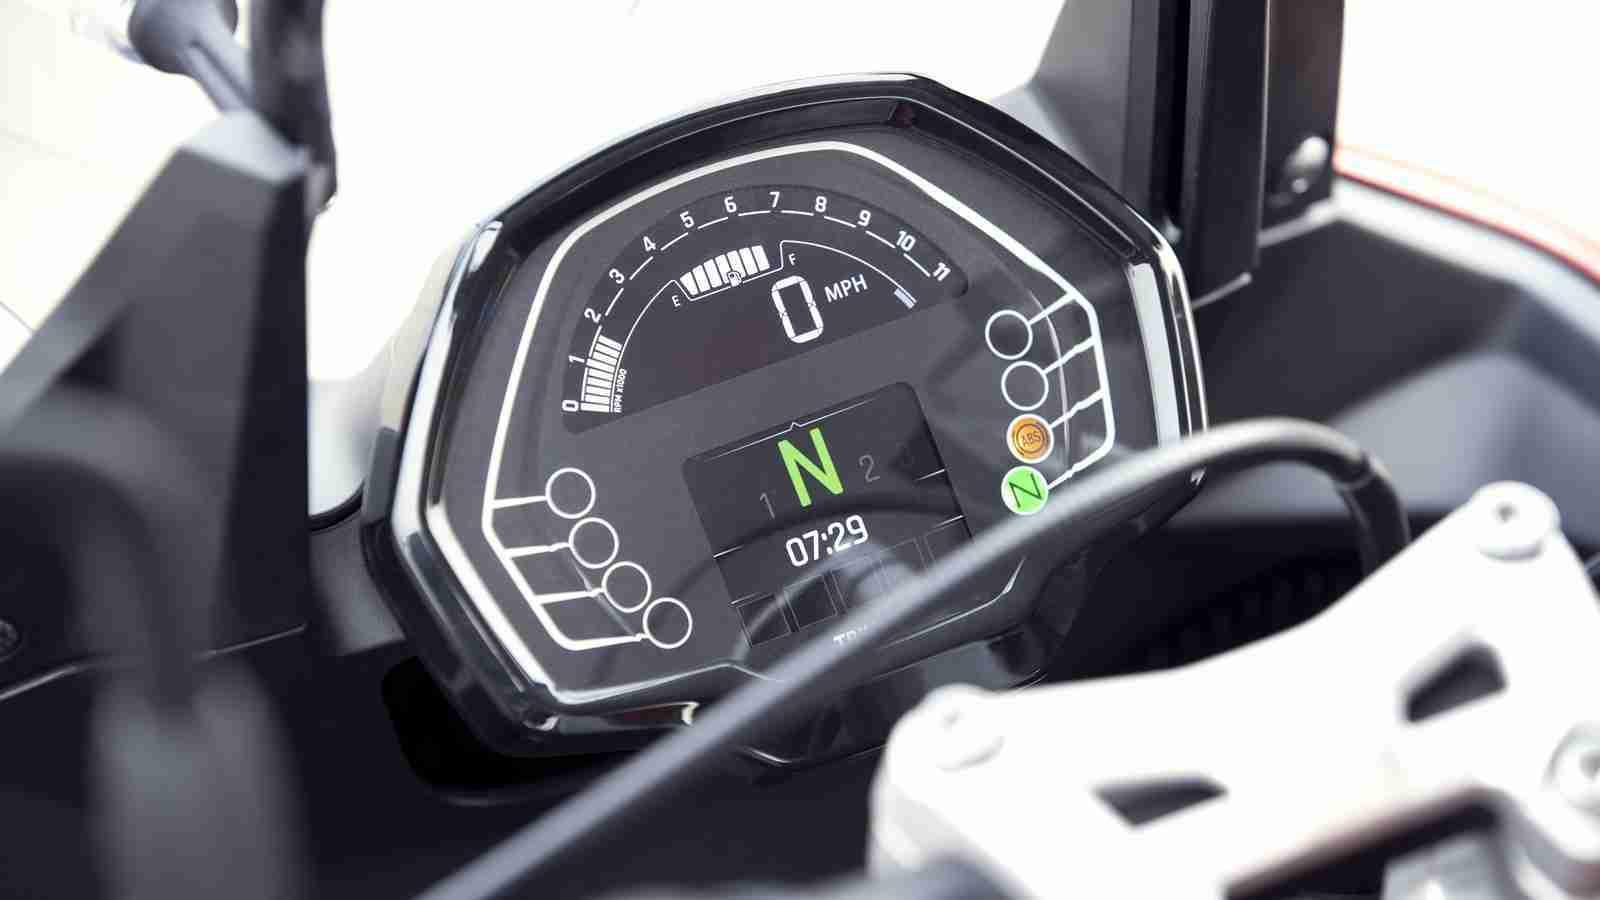 Triumph Tiger Sport 660 digital TFT screen